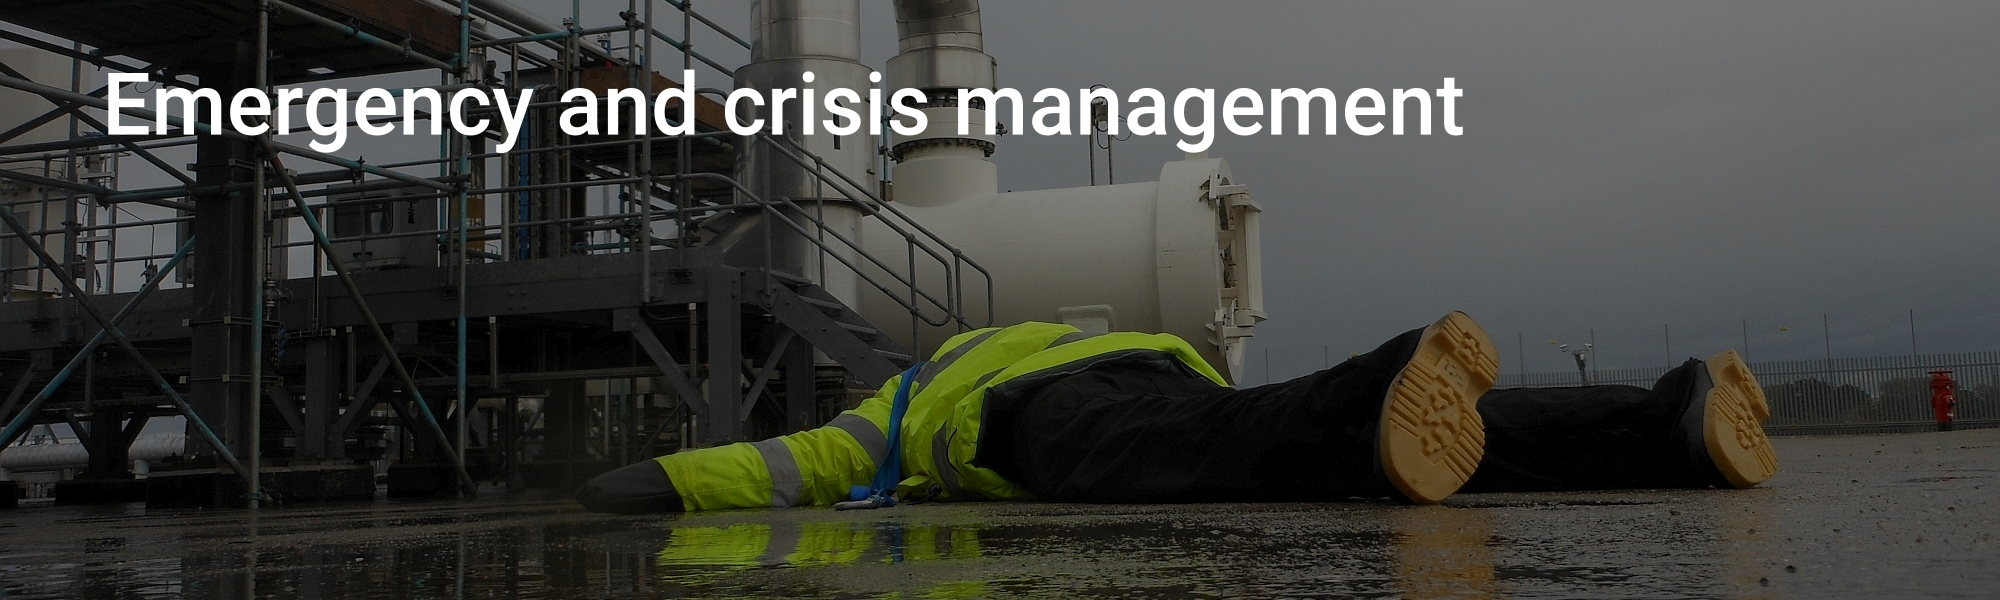 Eddistone Consulting Ltd - Emergency and crisis management